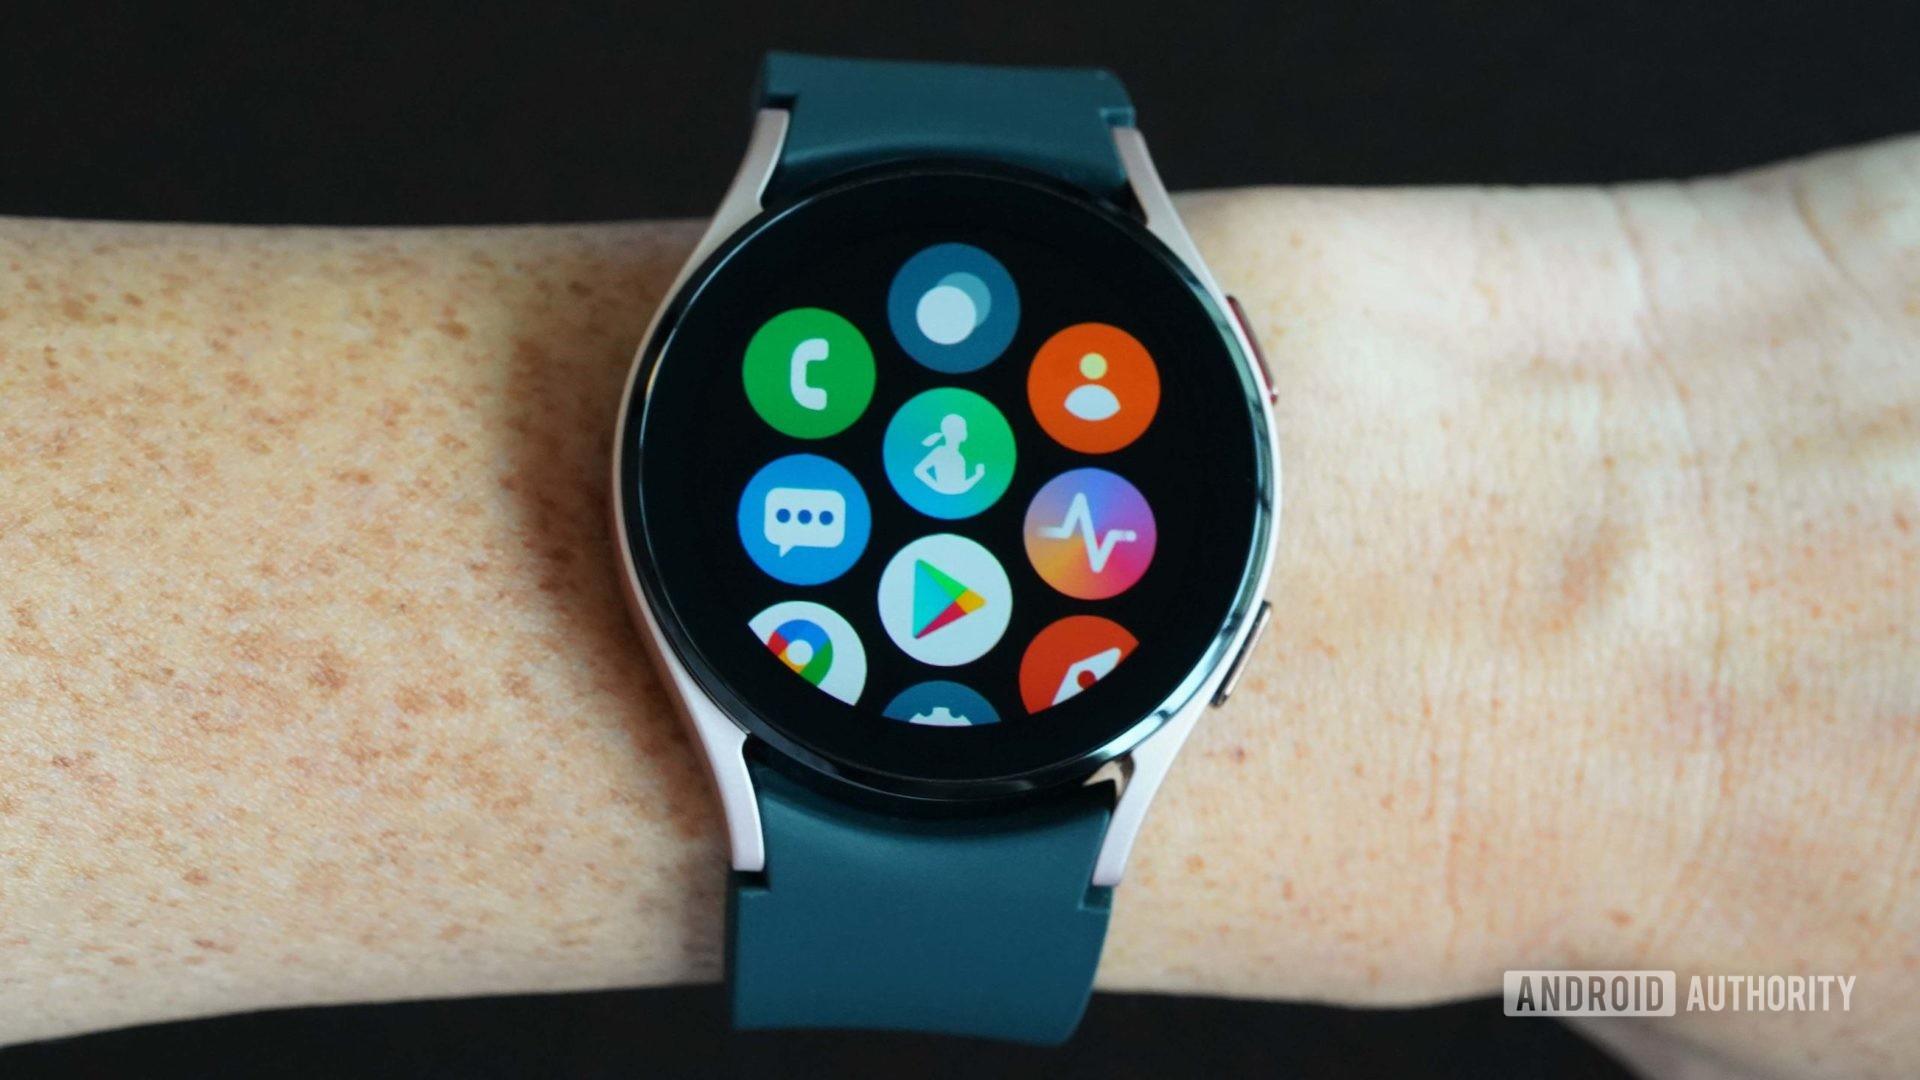 Samsung Galaxy Watch 4 displays app screen on a black background.